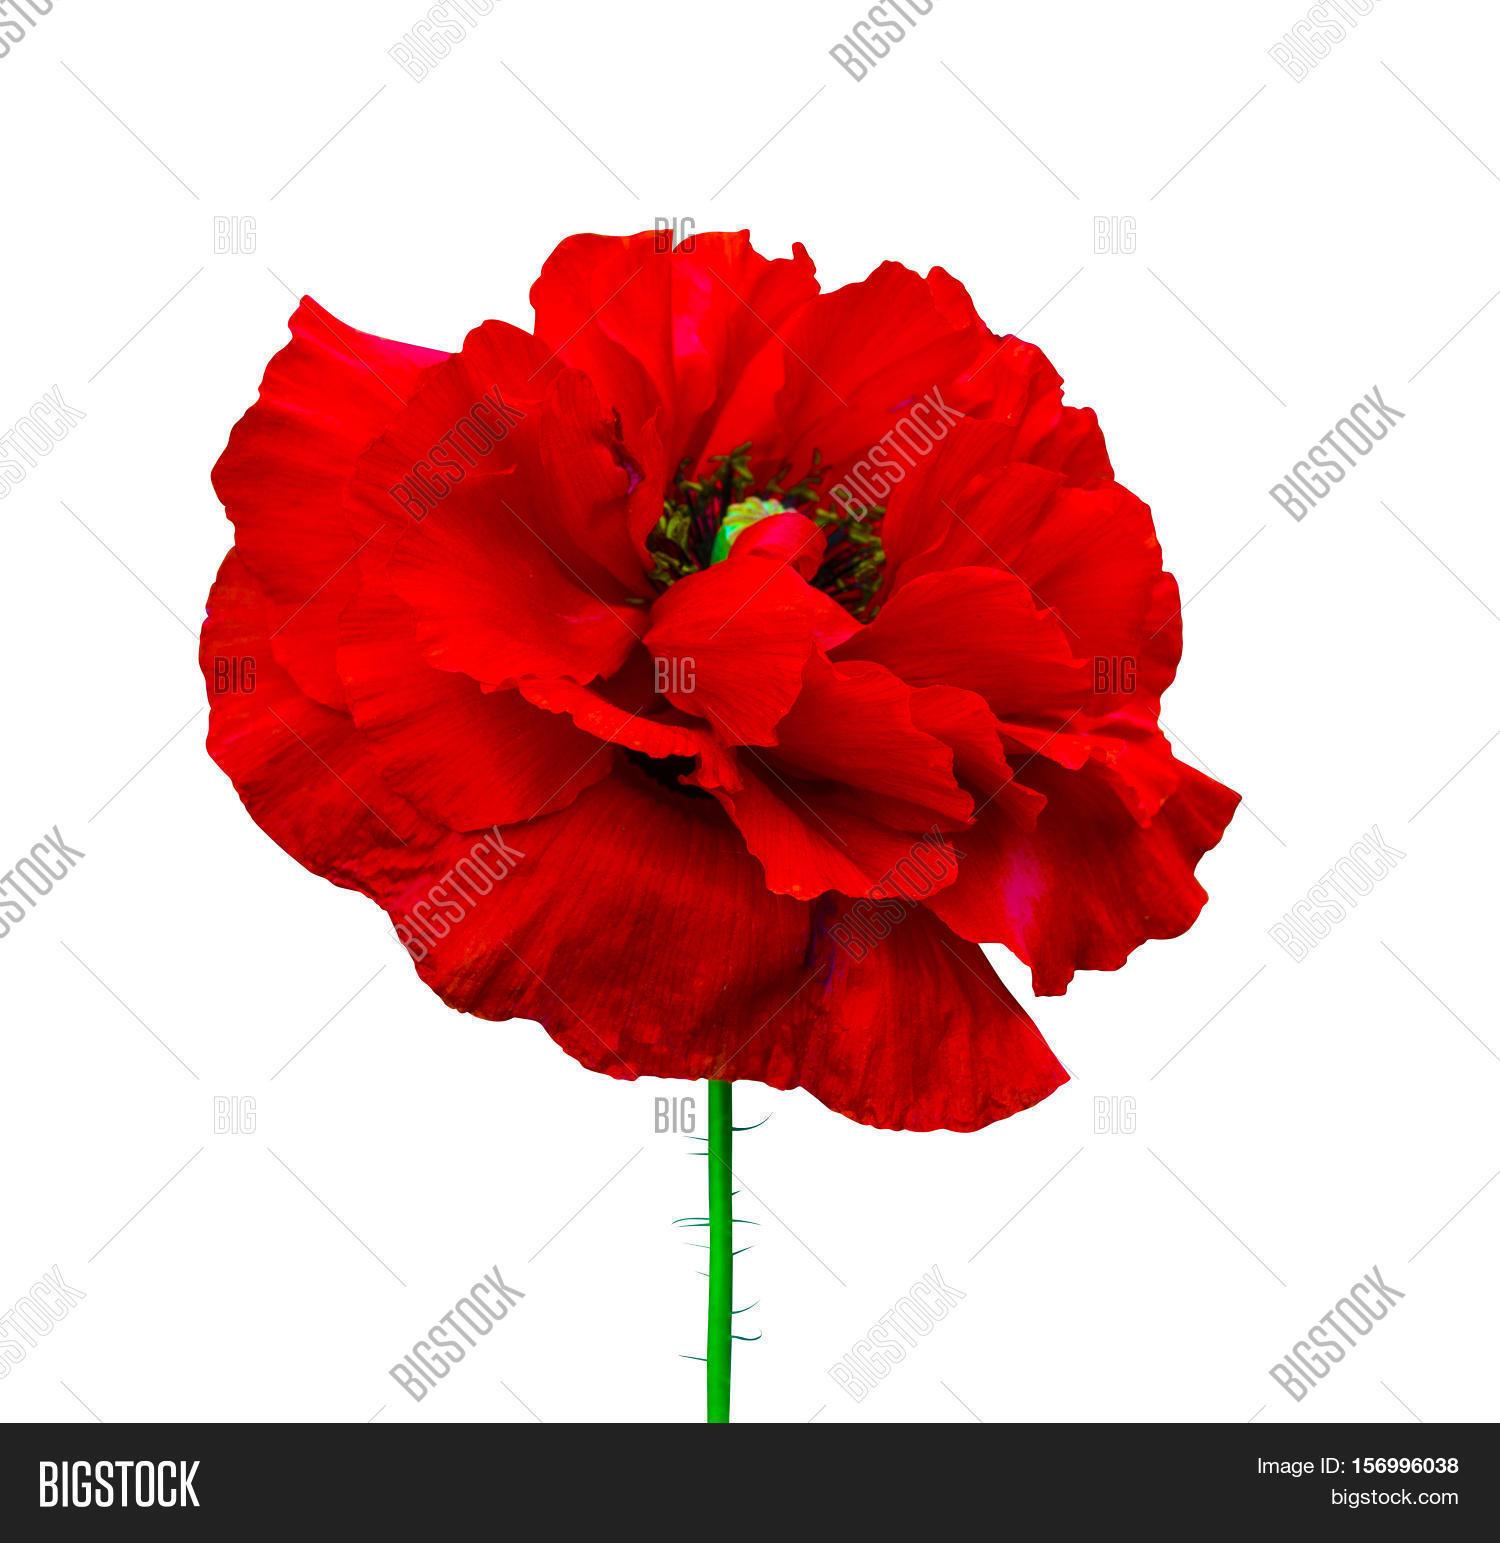 Poppy Red Poppy Image Photo Free Trial Bigstock